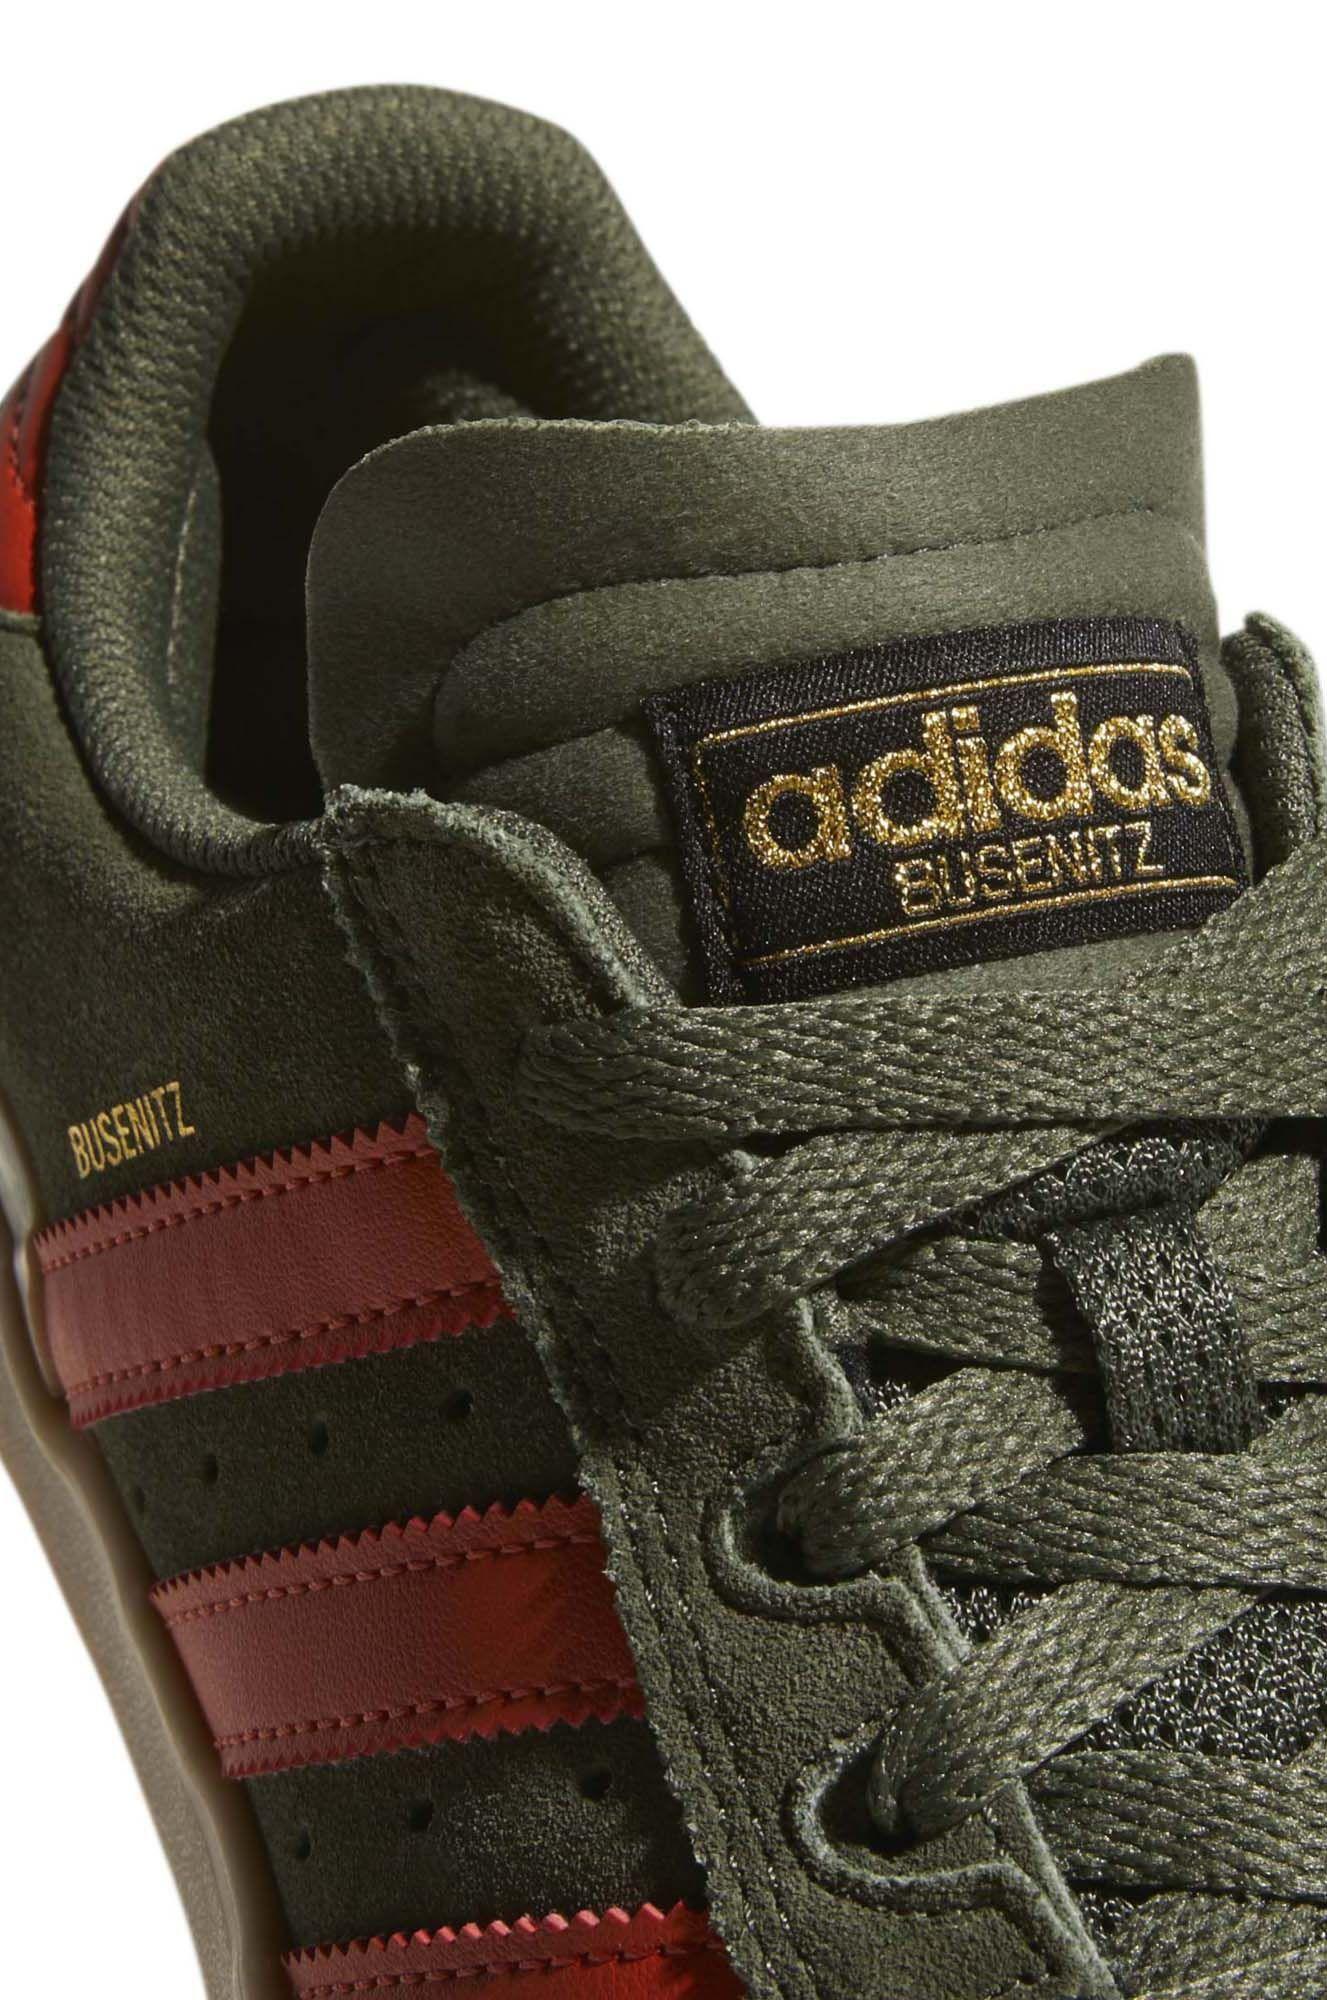 13b942493cba ... Adidas Shoes BUSENITZ VULC Base Green Raw Amber Gum4